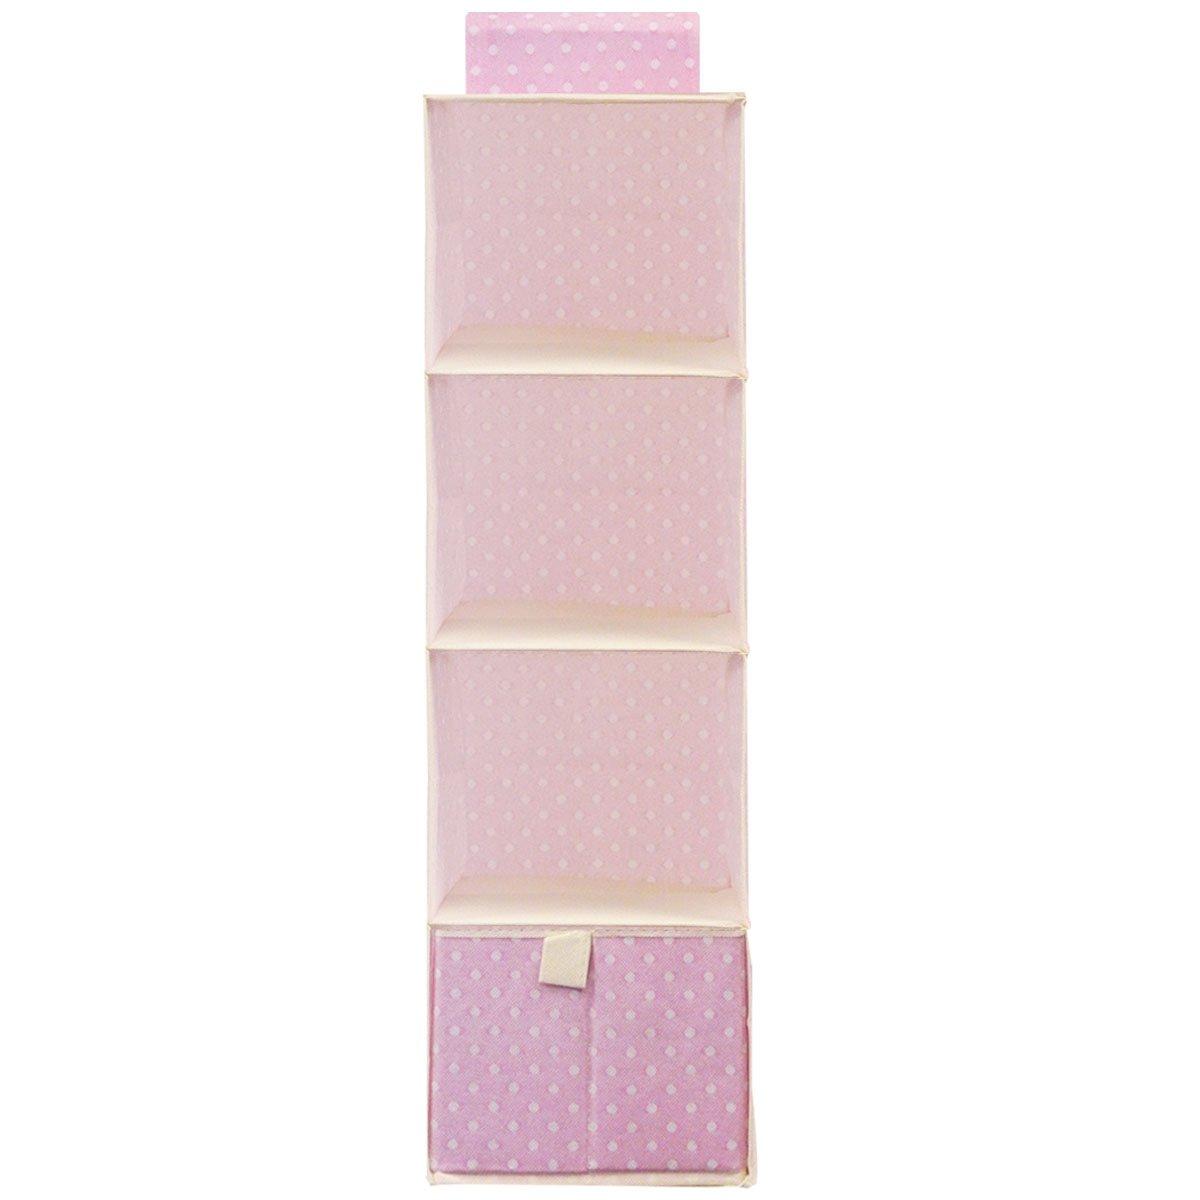 Wrapables 4 Shelf with 1 Drawer Hanging Nursery Closet Organizer, Pink